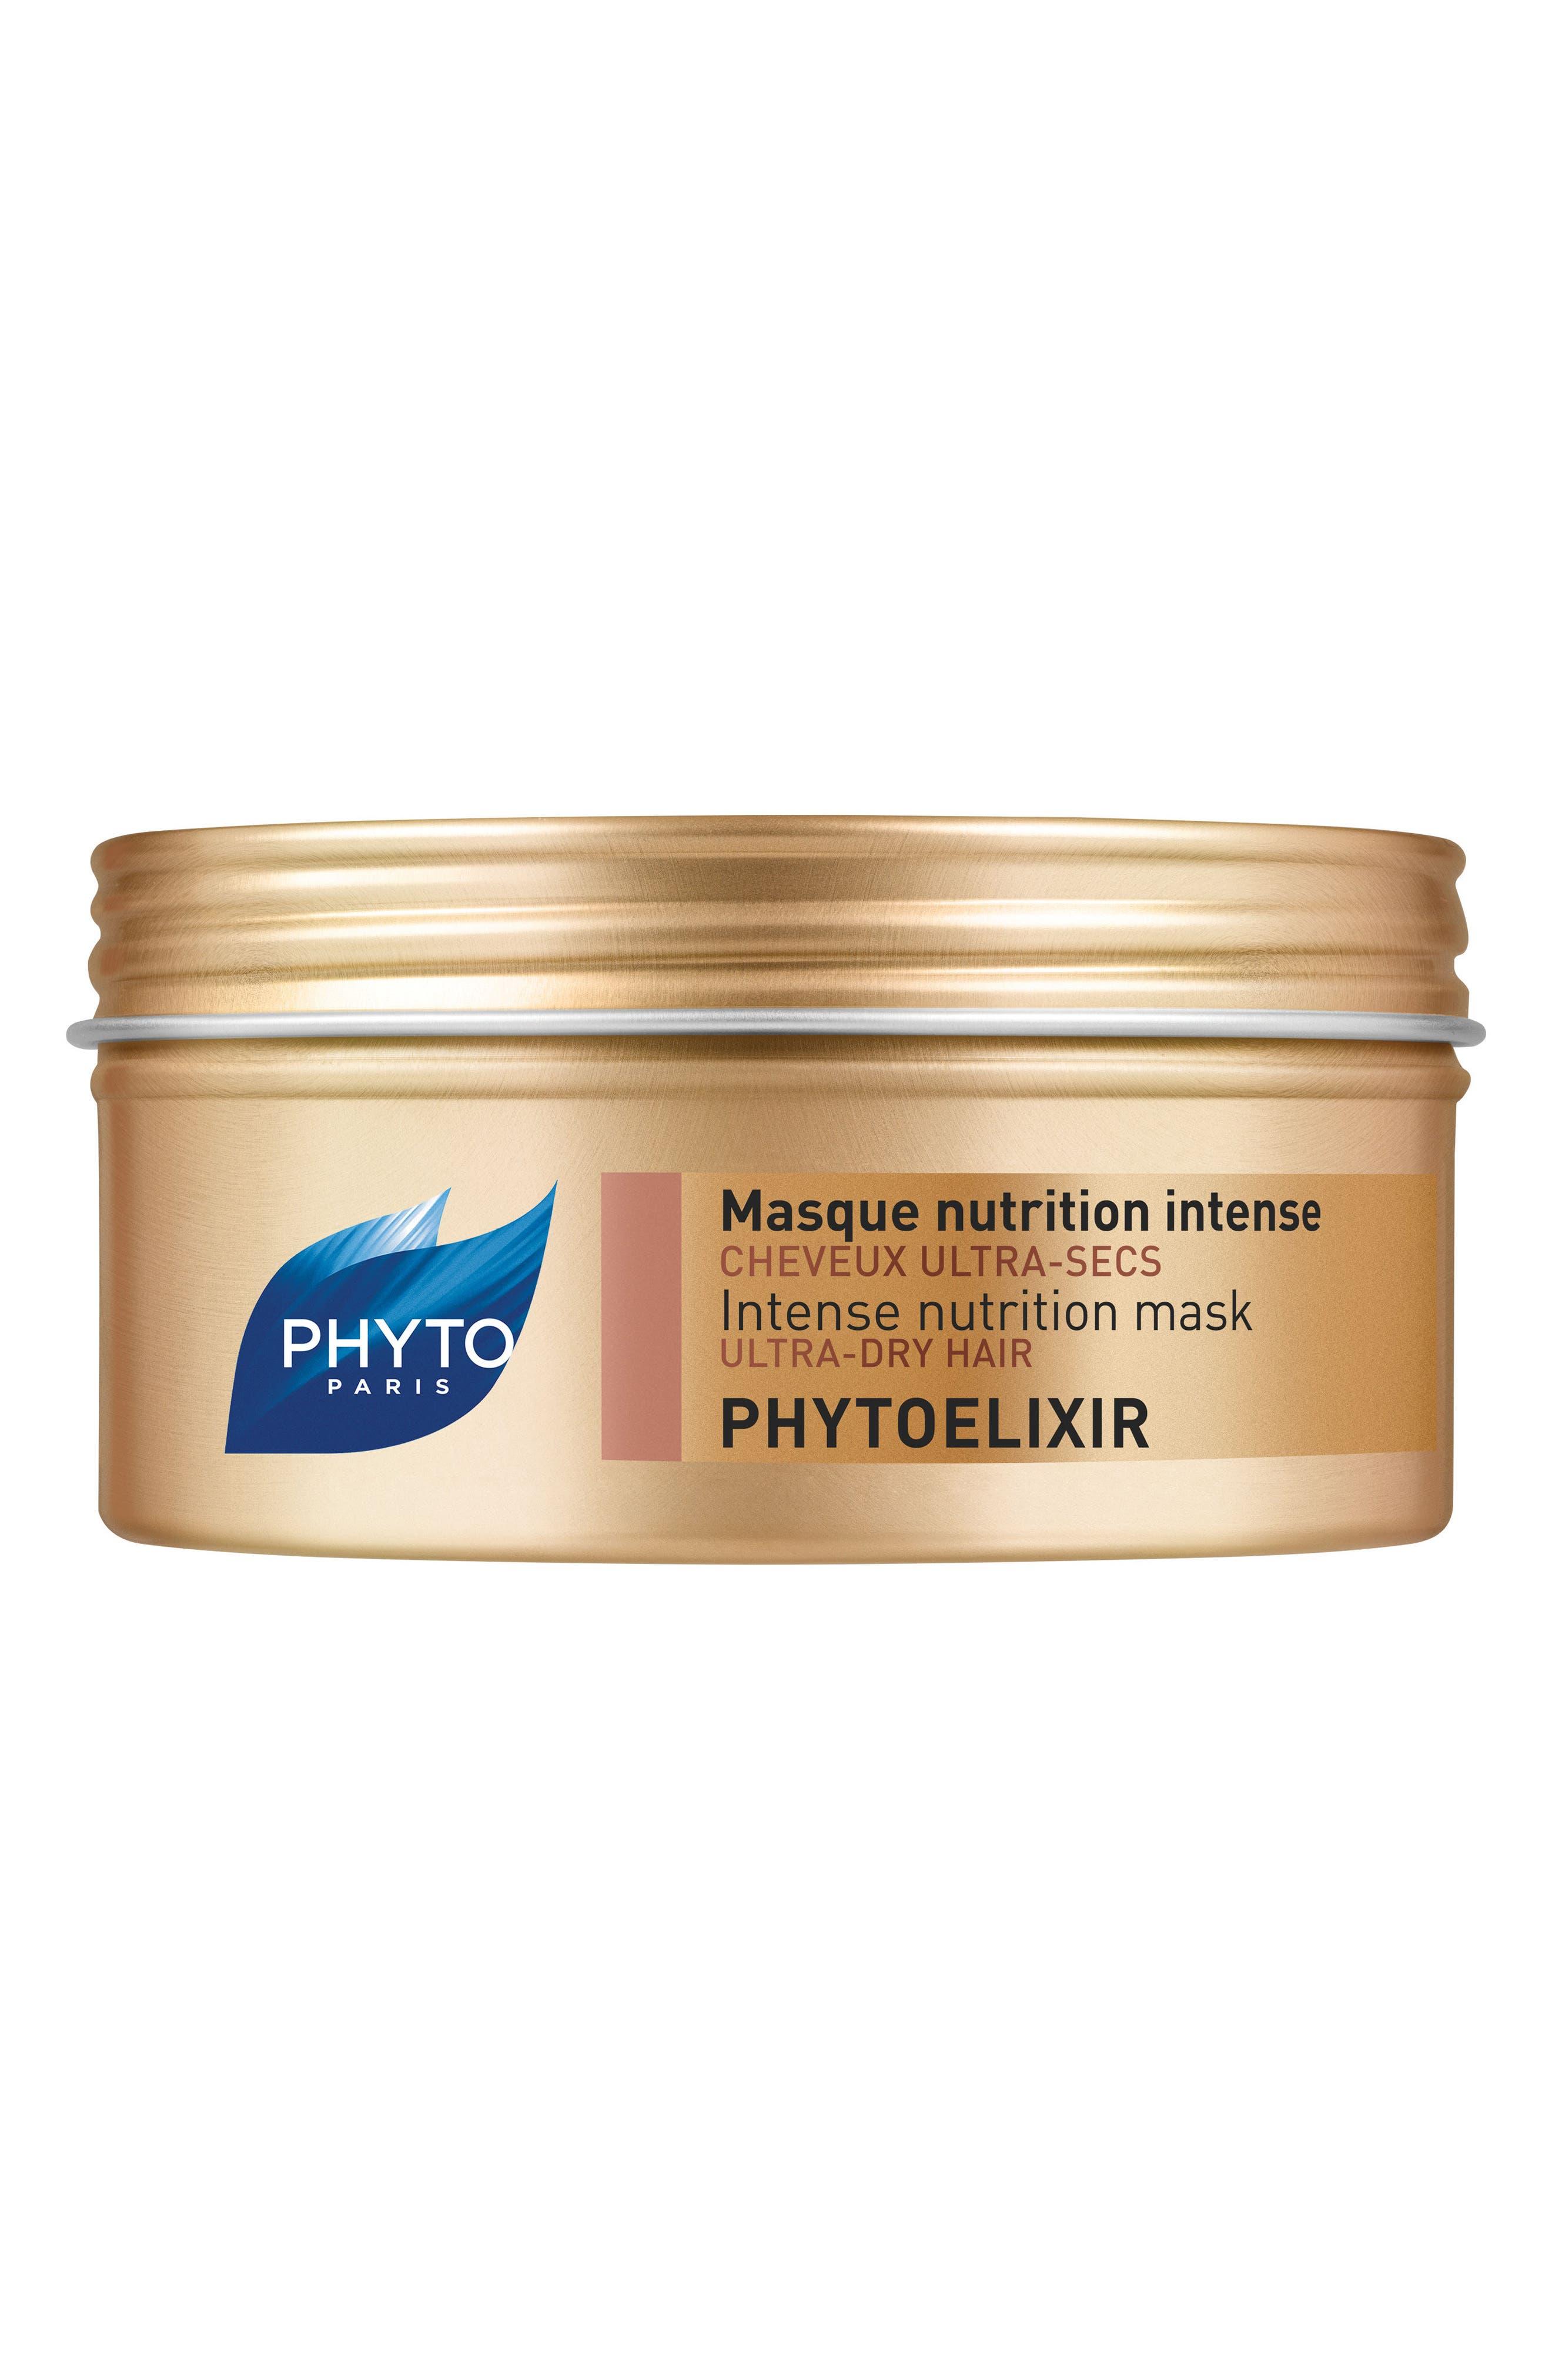 Main Image - PHYTO Phytoelixir Intense Nutrition Mask